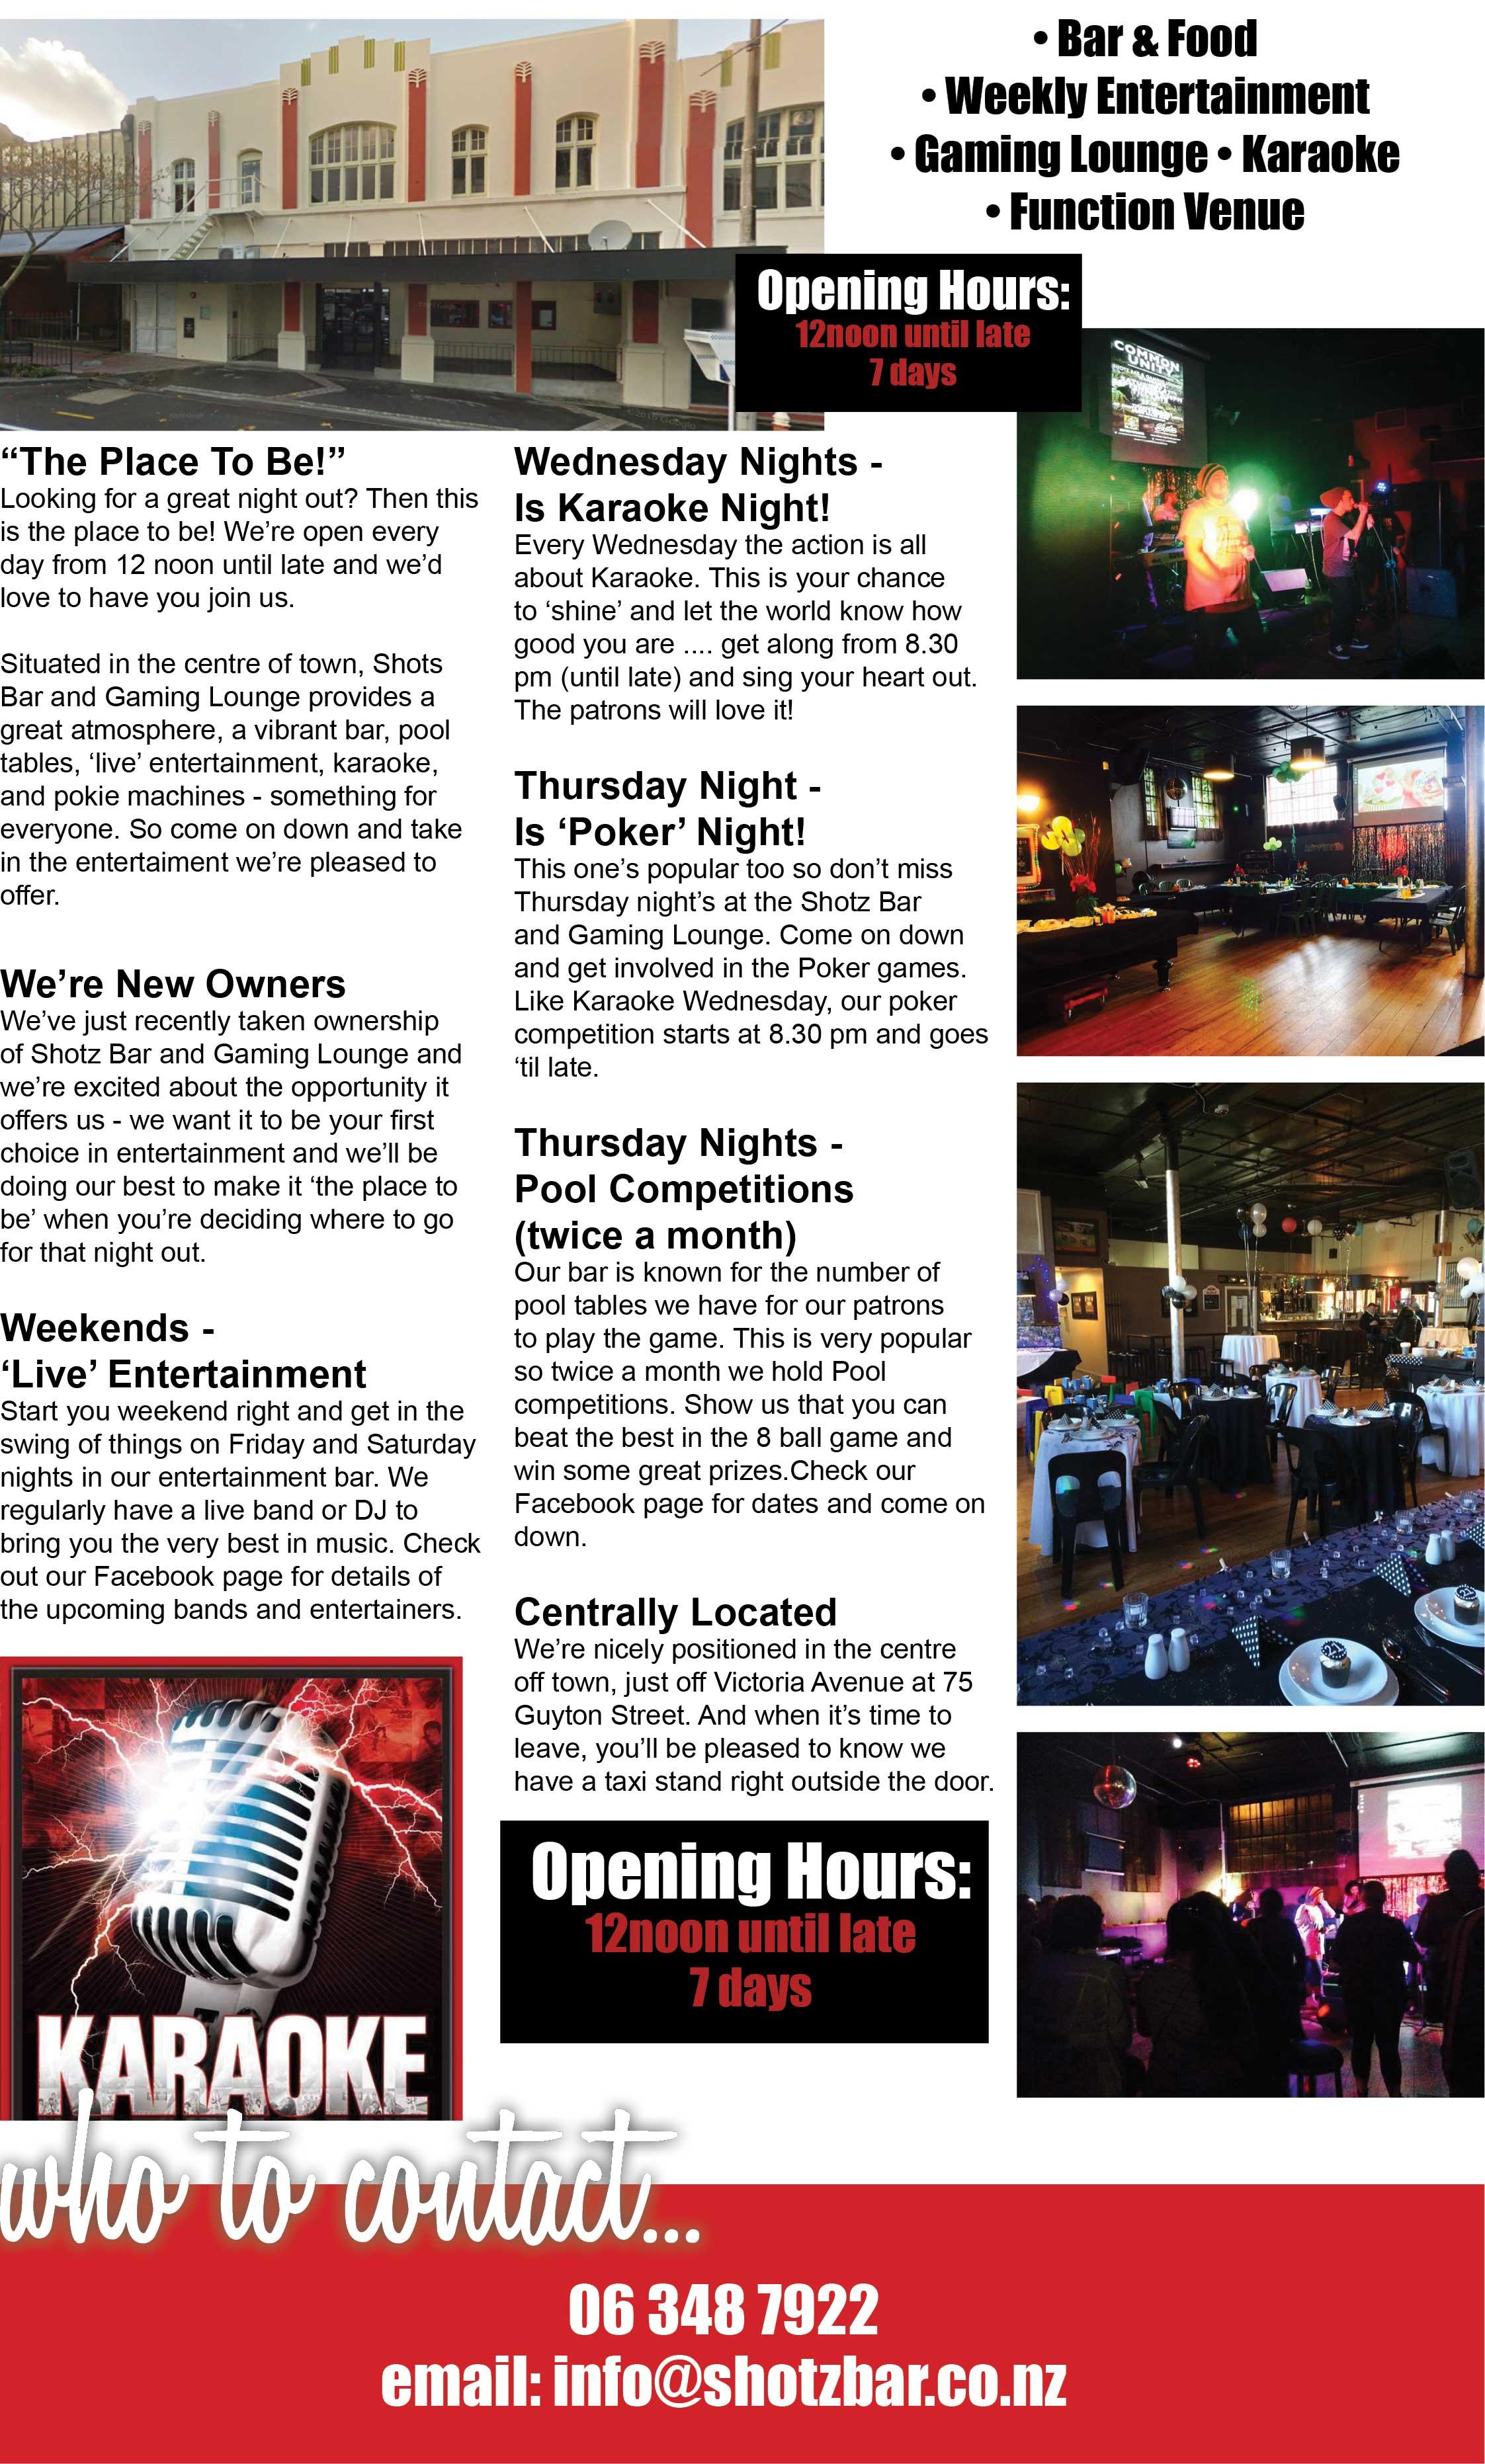 Welcome to 'Shotz Bar & Gaming Lounge'